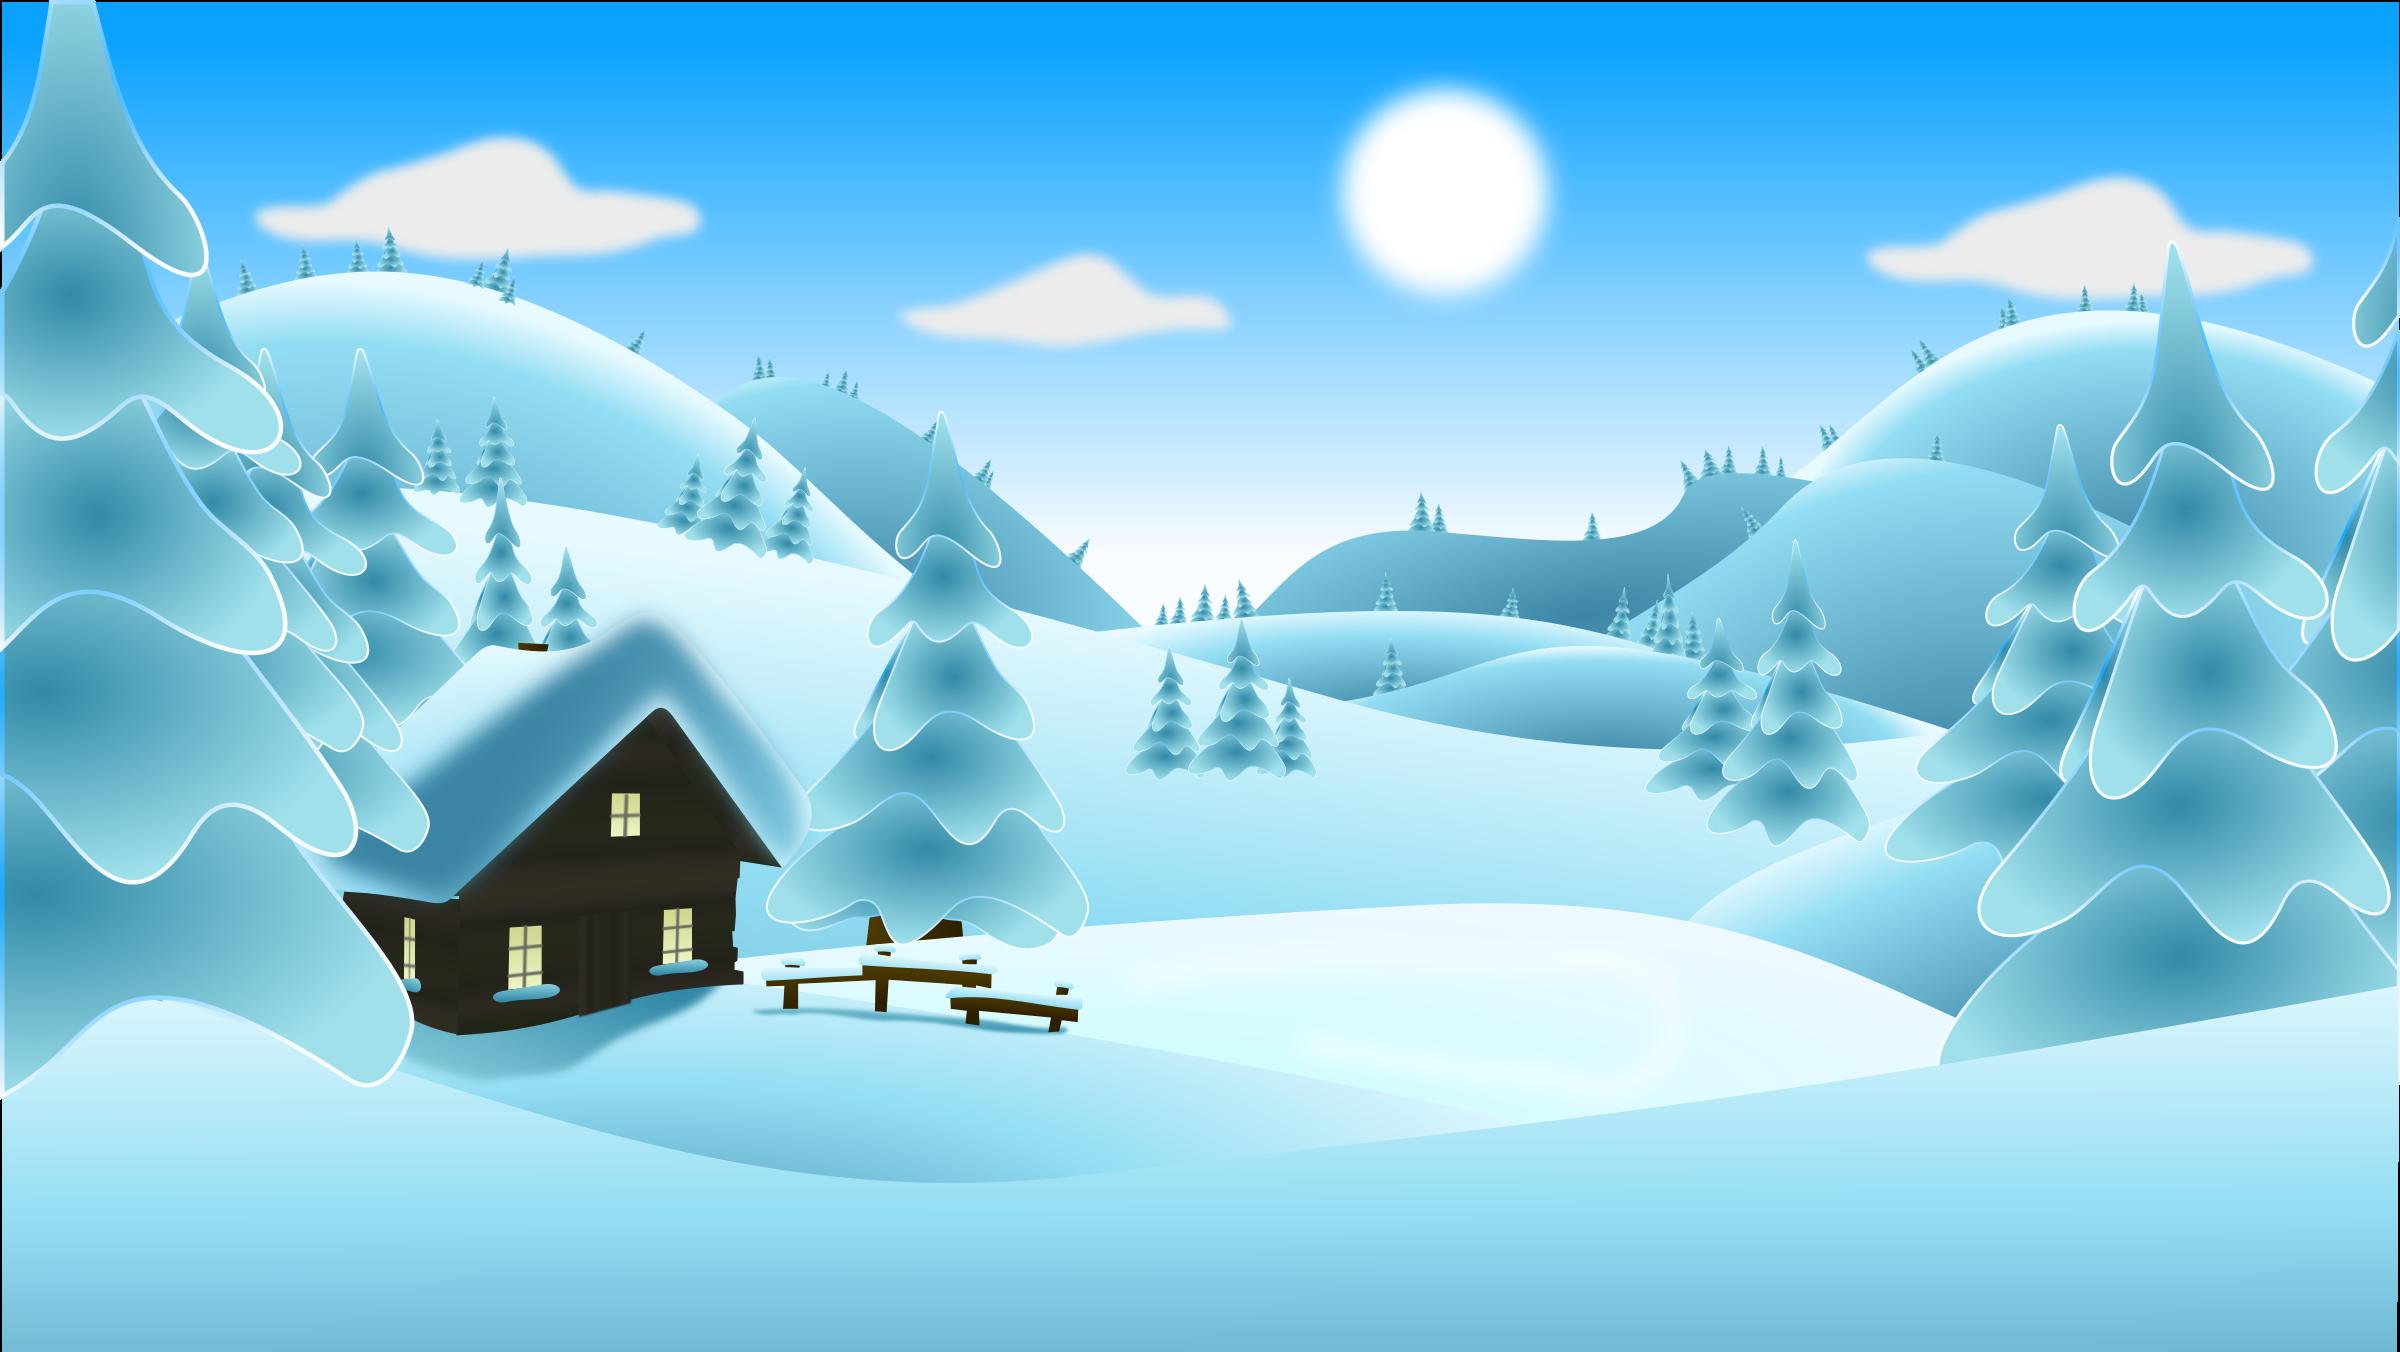 Clipart winter day. Landscape no snowman icons